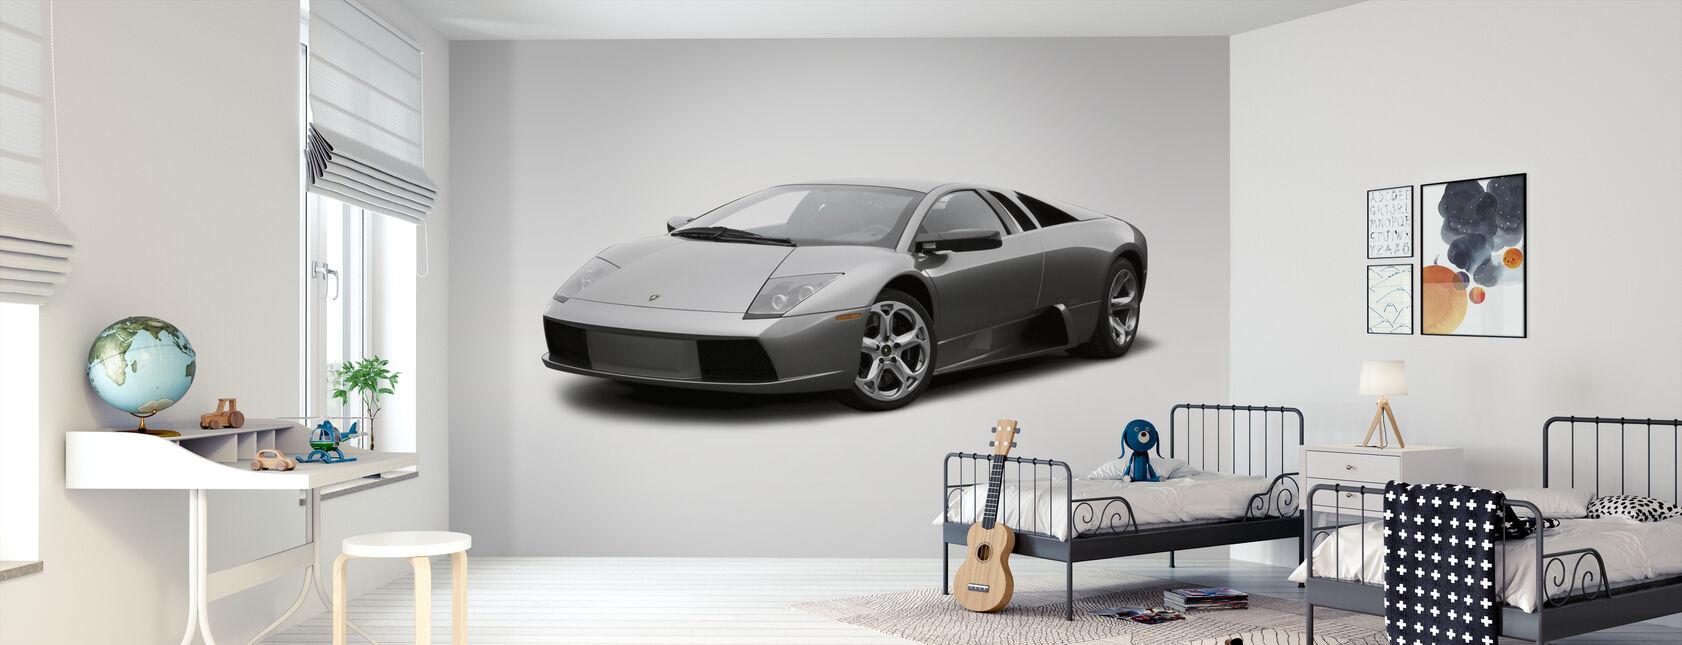 Lamborghini - Tapeta - Pokój dziecięcy